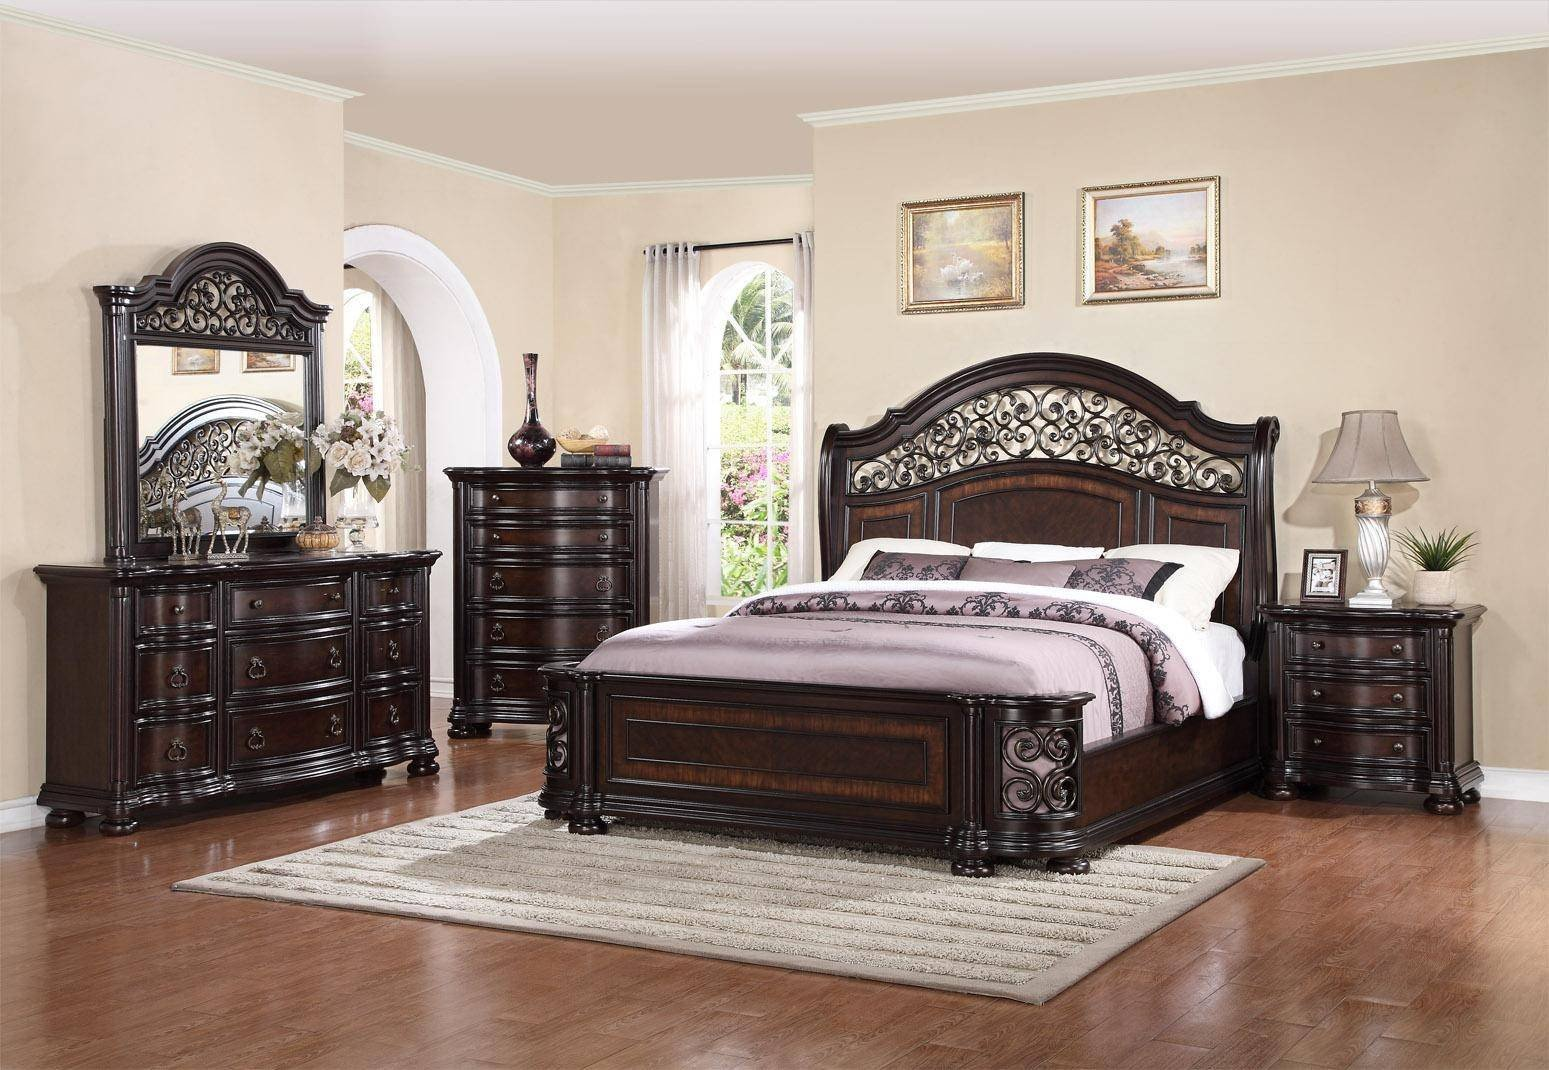 Bedroom Set California King Best Of Mcferran B366 Allison Espresso Finish solid Hardwood